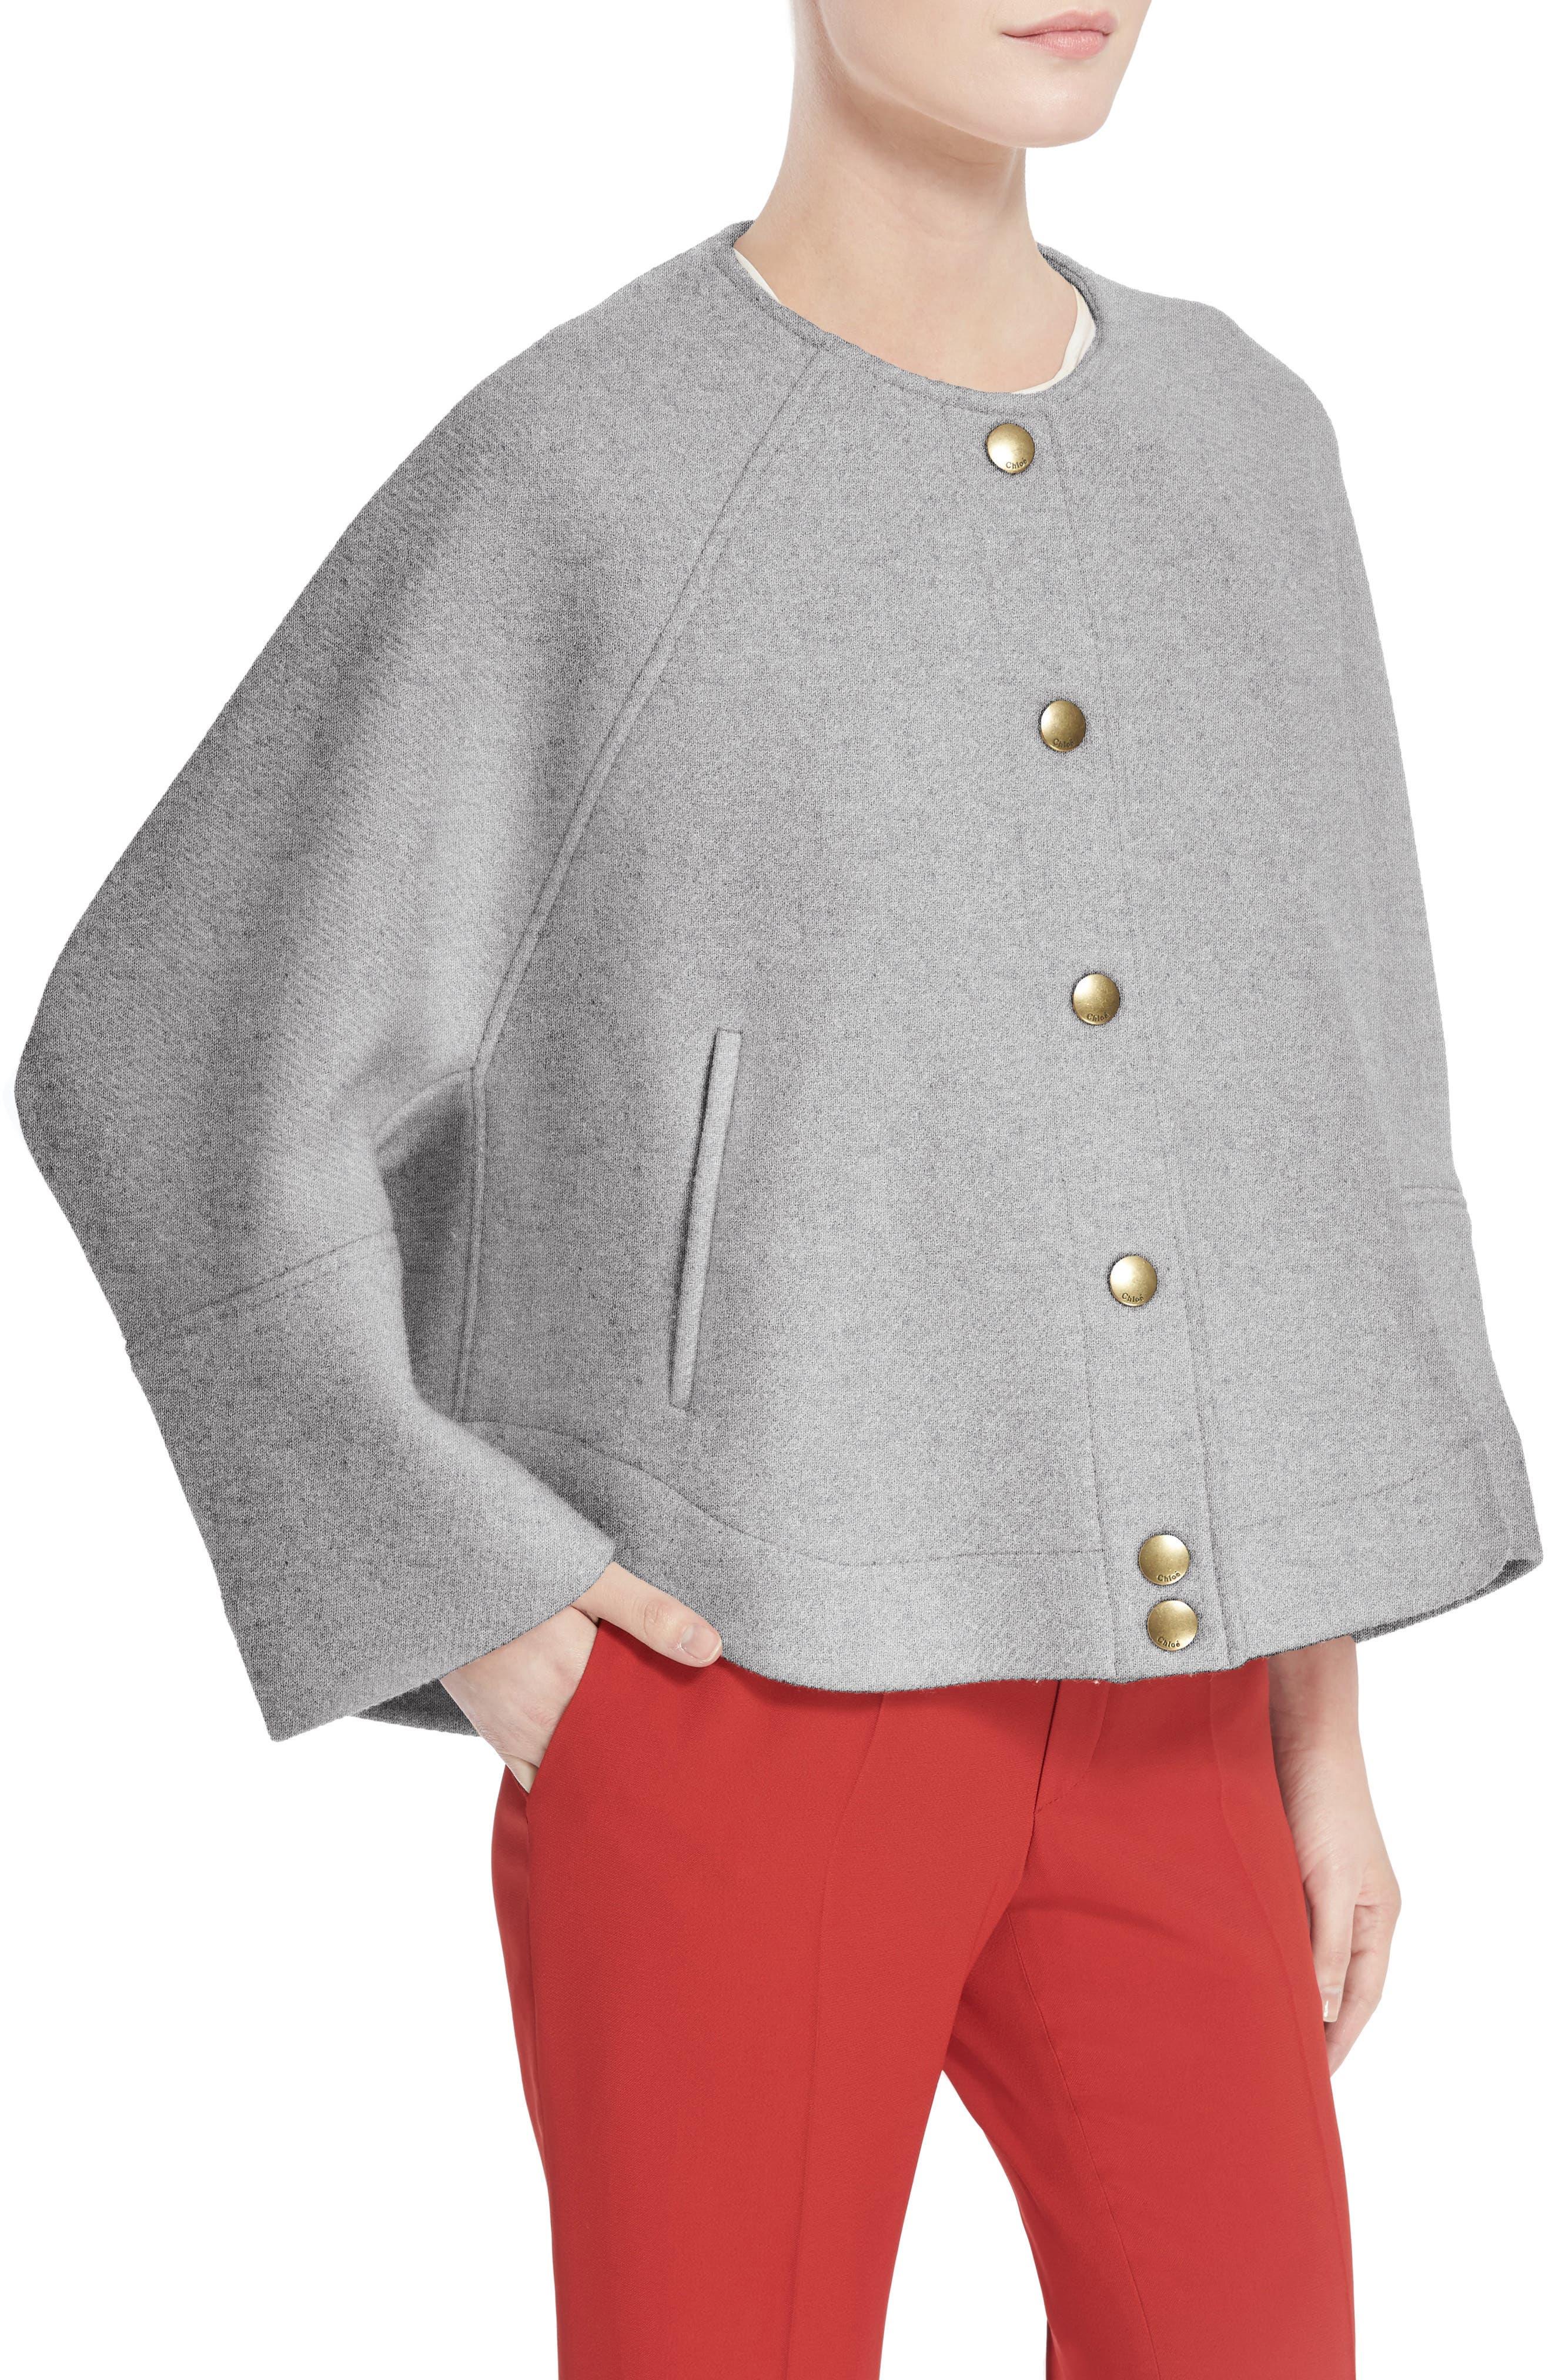 Wool Blend Baseball Jacket,                             Alternate thumbnail 4, color,                             030